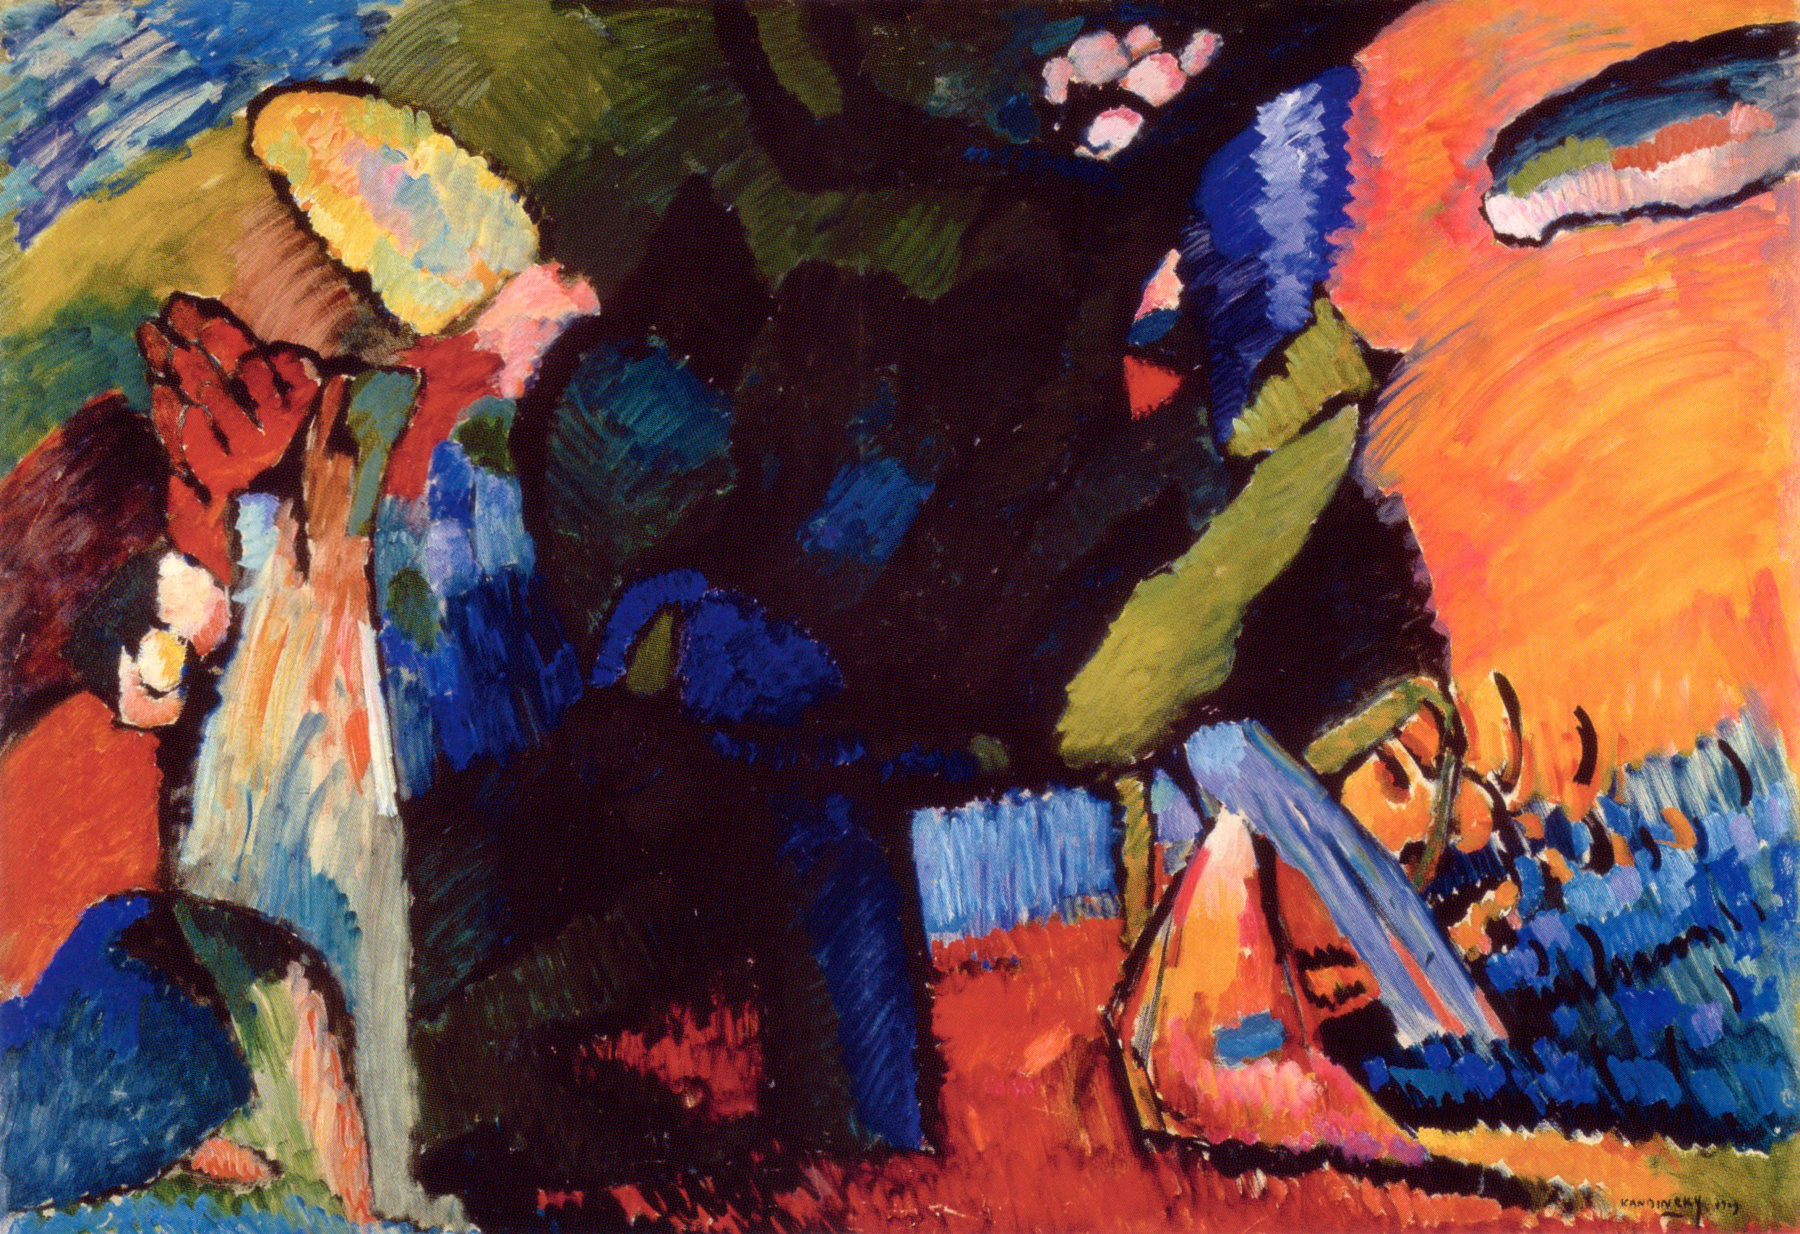 Kandinsky, Improvisação 4, 1909